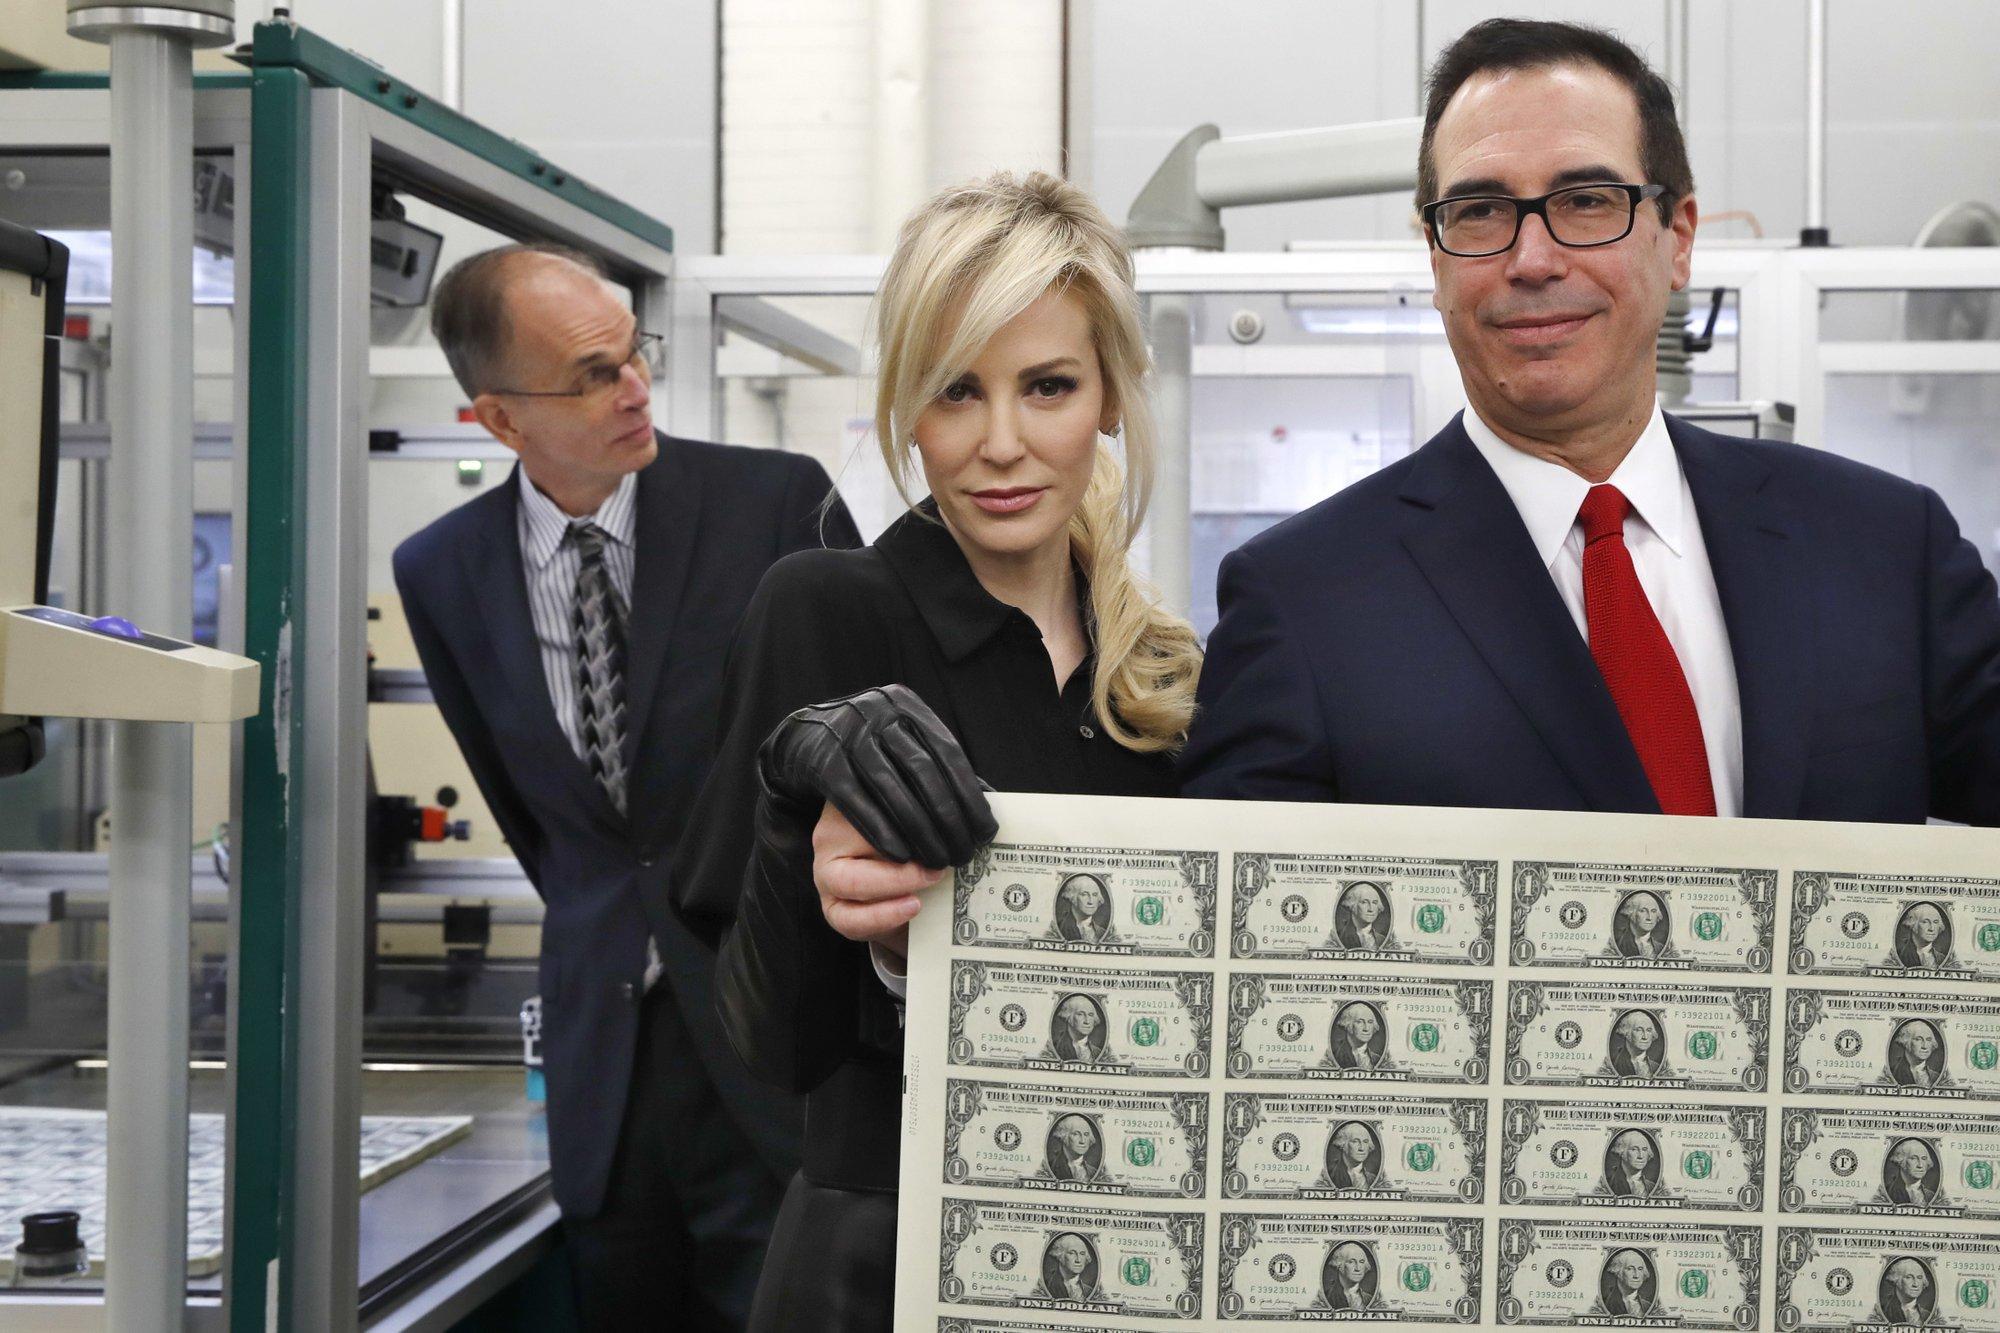 Treasury head, wife mocked for photo of them holding money